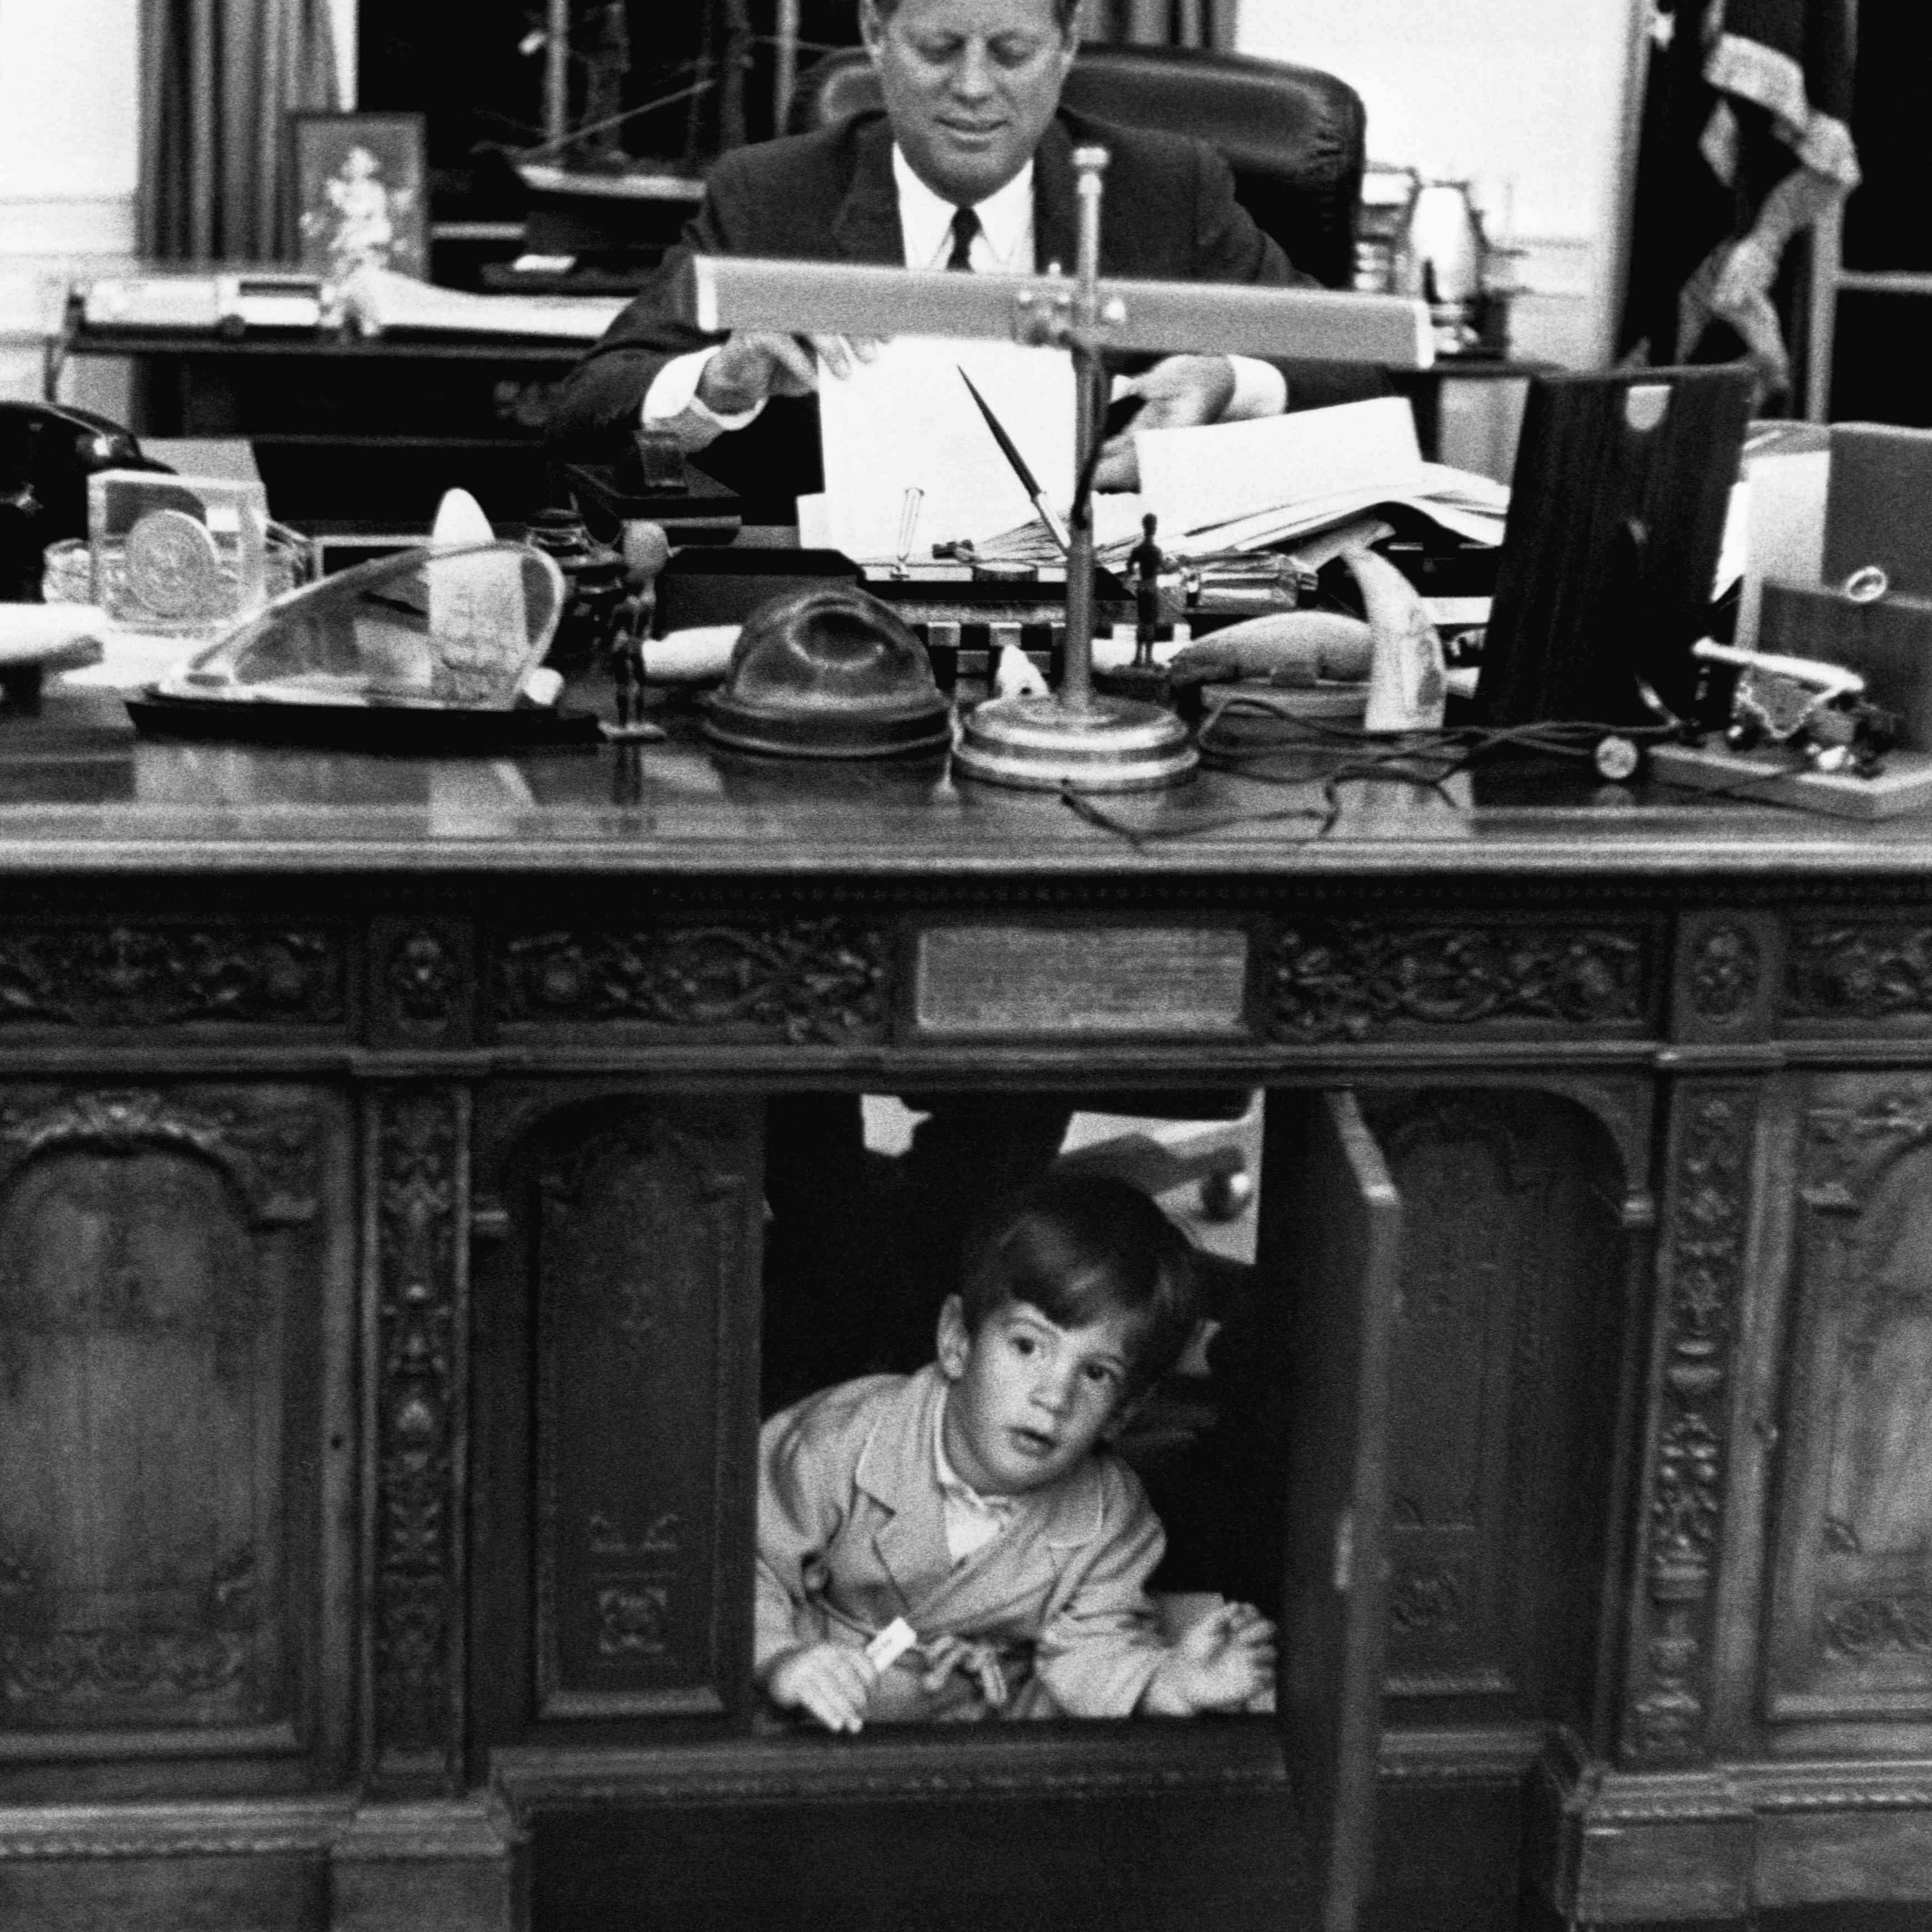 John Kennedy, Jr., exploring his father's desk